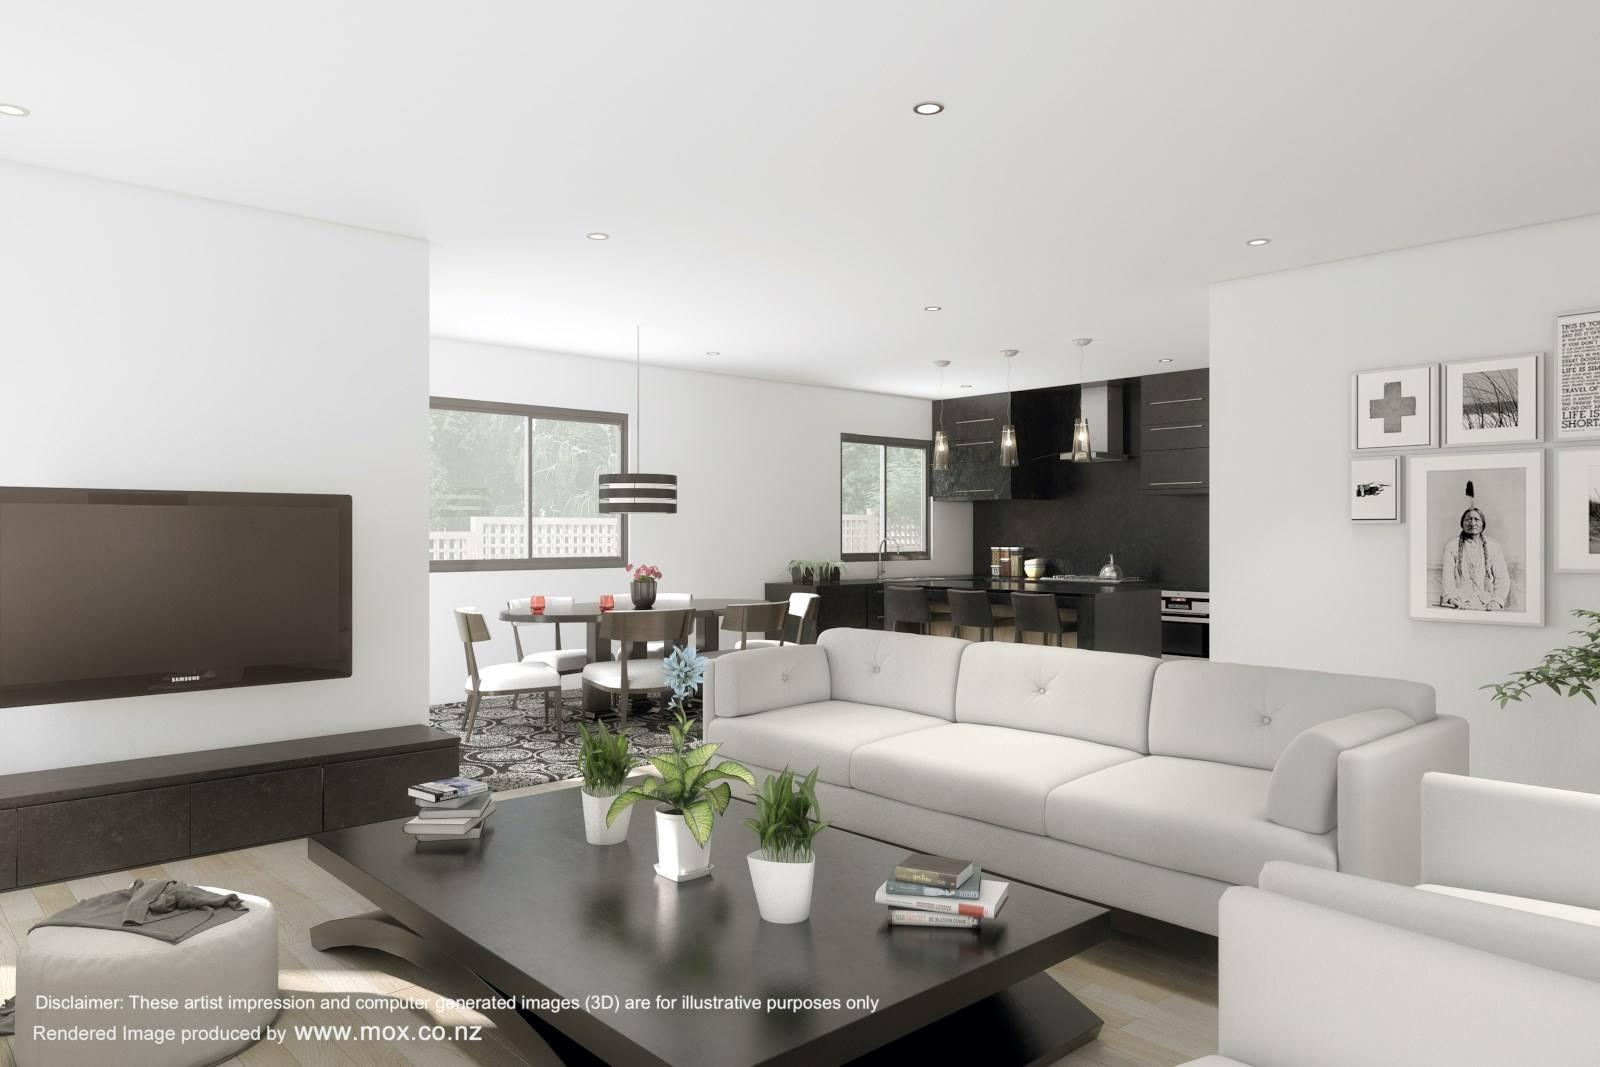 Pakuranga 4房 全新意式奢居 可自选装潢/配色方案 10年质保 预计2020年4月竣工! Brand New Home ? Complete in April 2020!